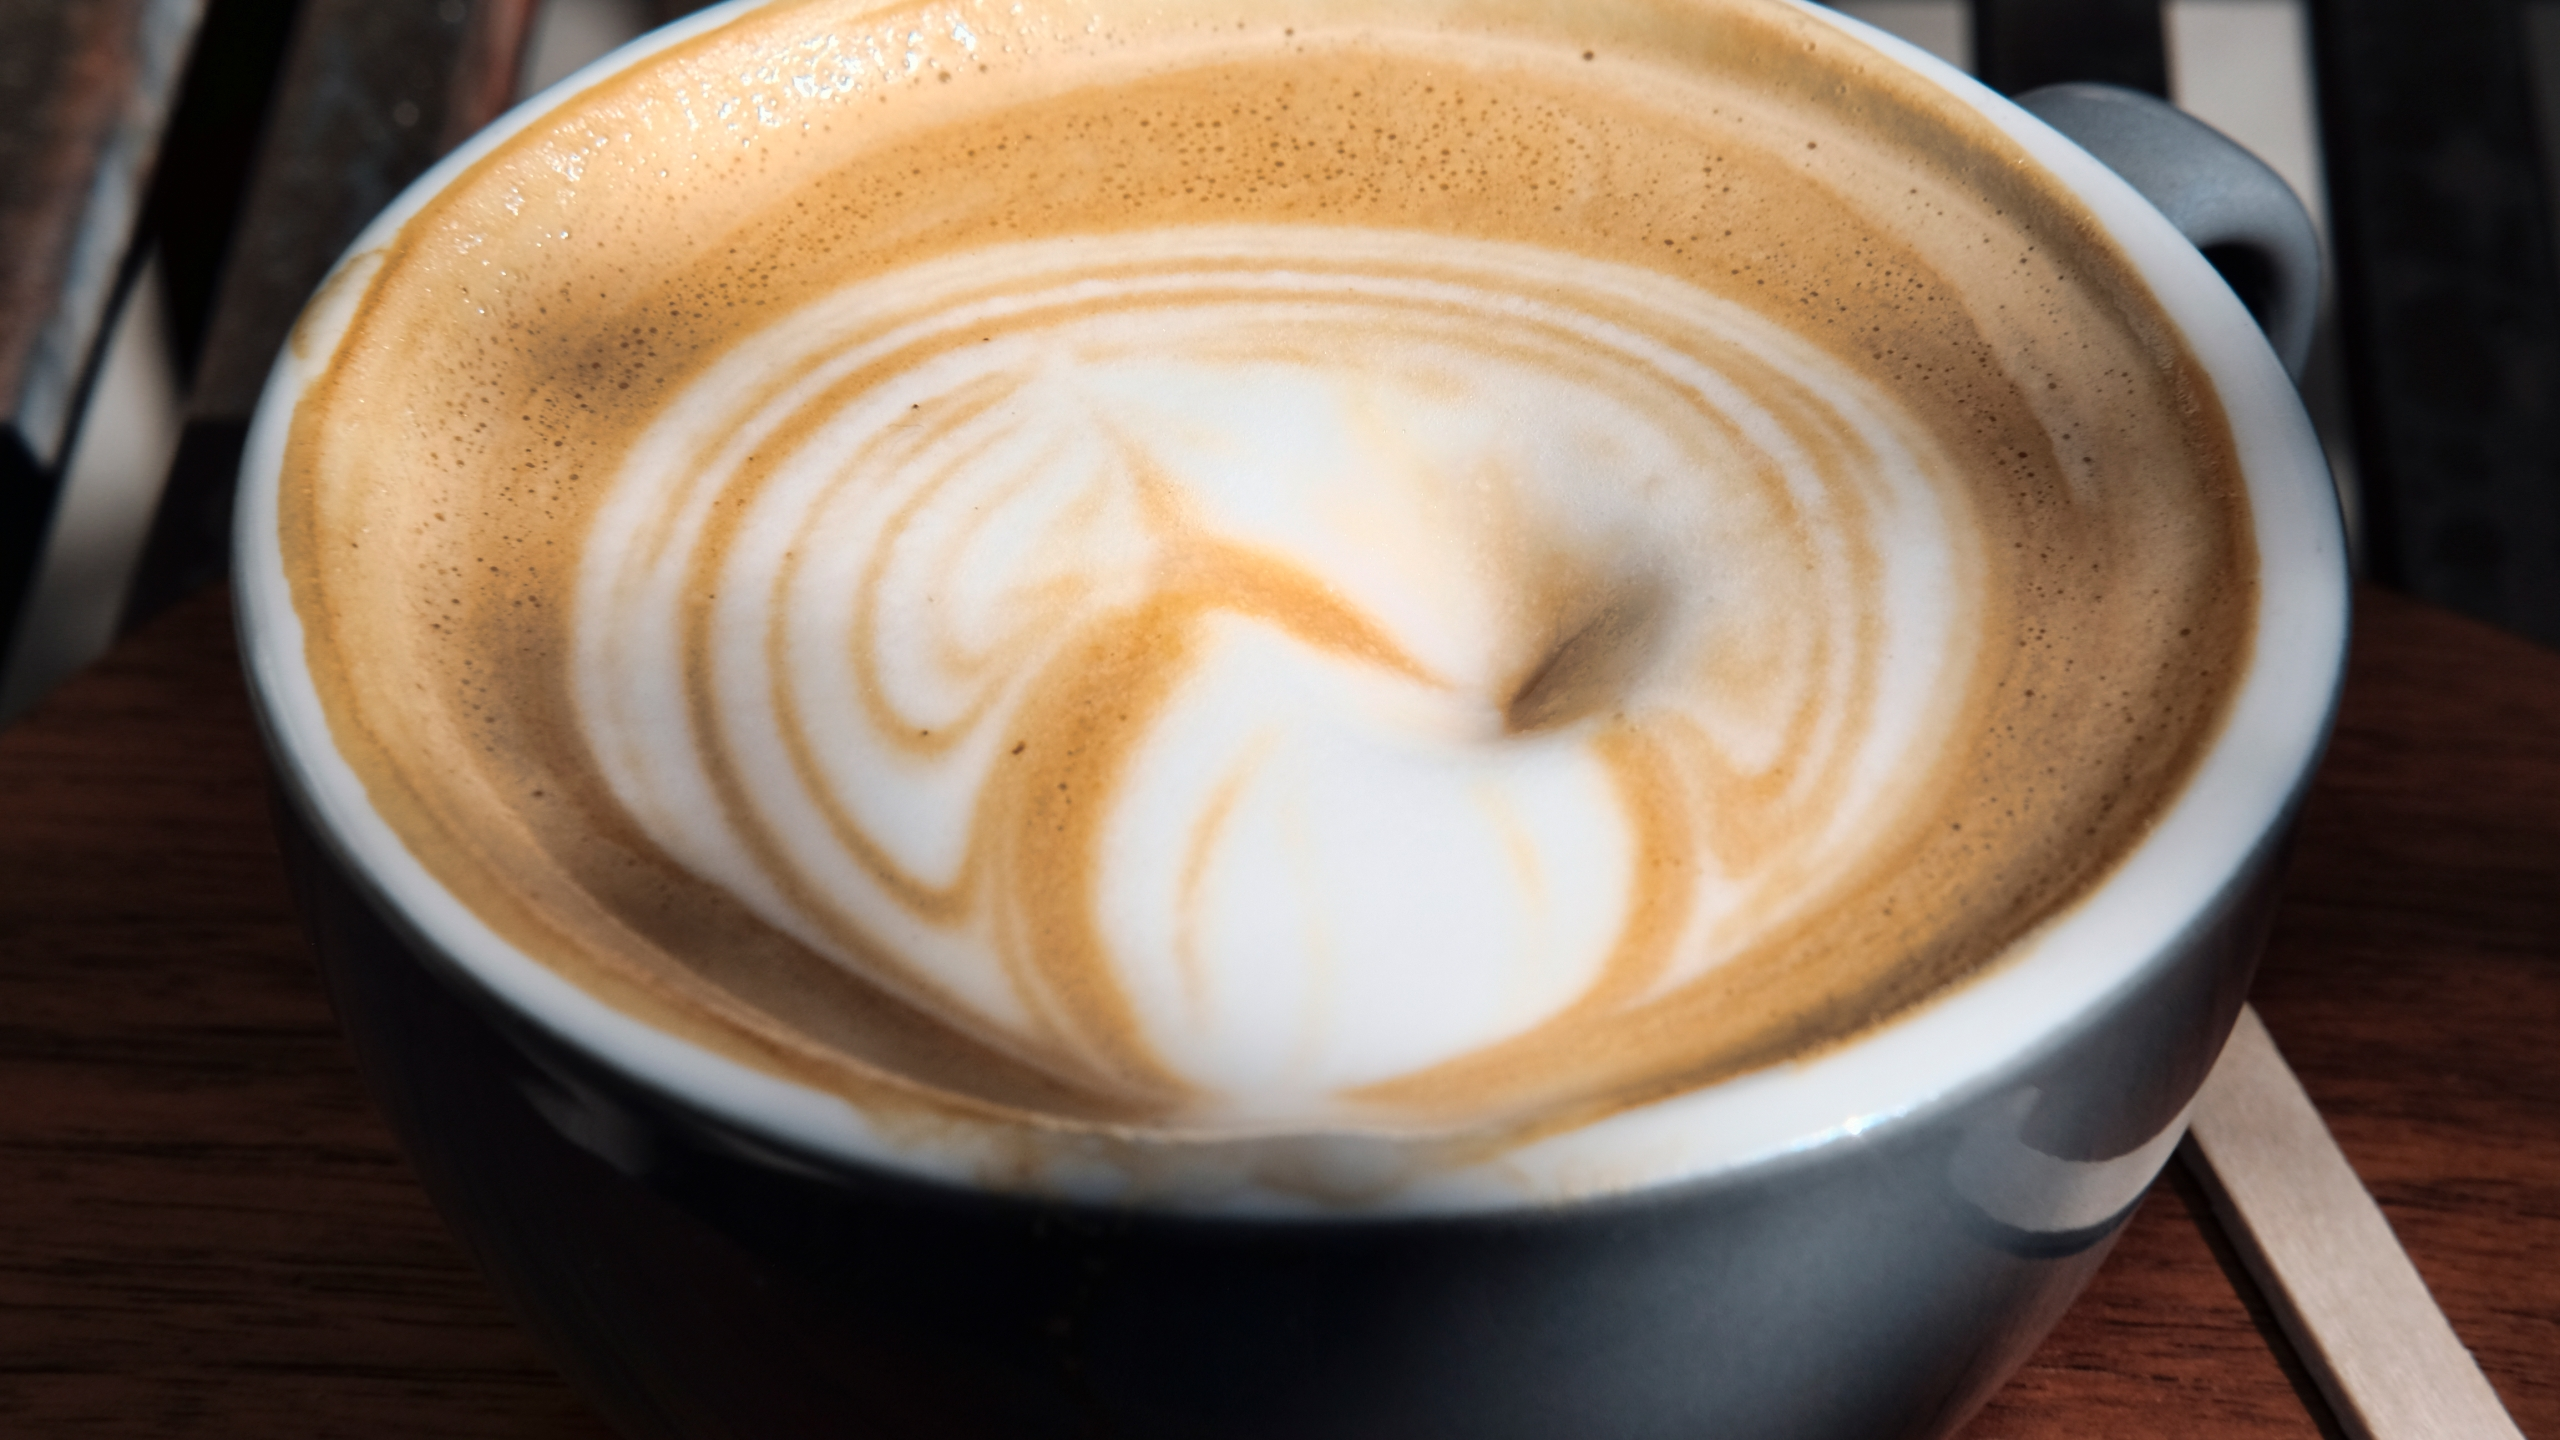 Coffee_Longevity_93658-159532.jpg66834626